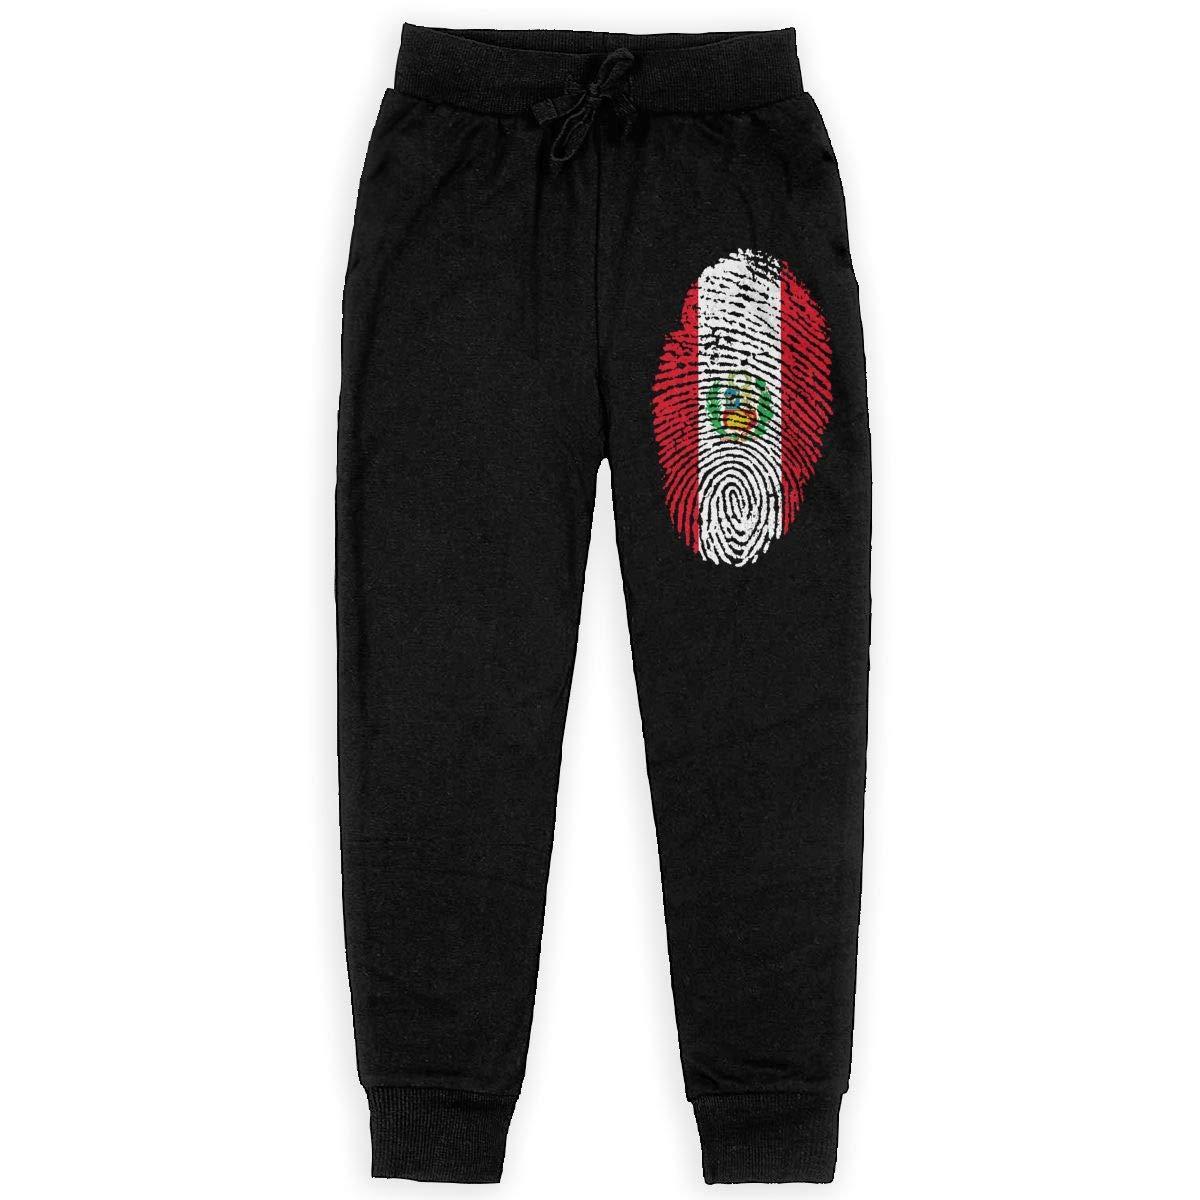 IufnNRJndfu Peru Boys Athletic Smart Fleece Pant Youth Soft and Cozy Sweatpants